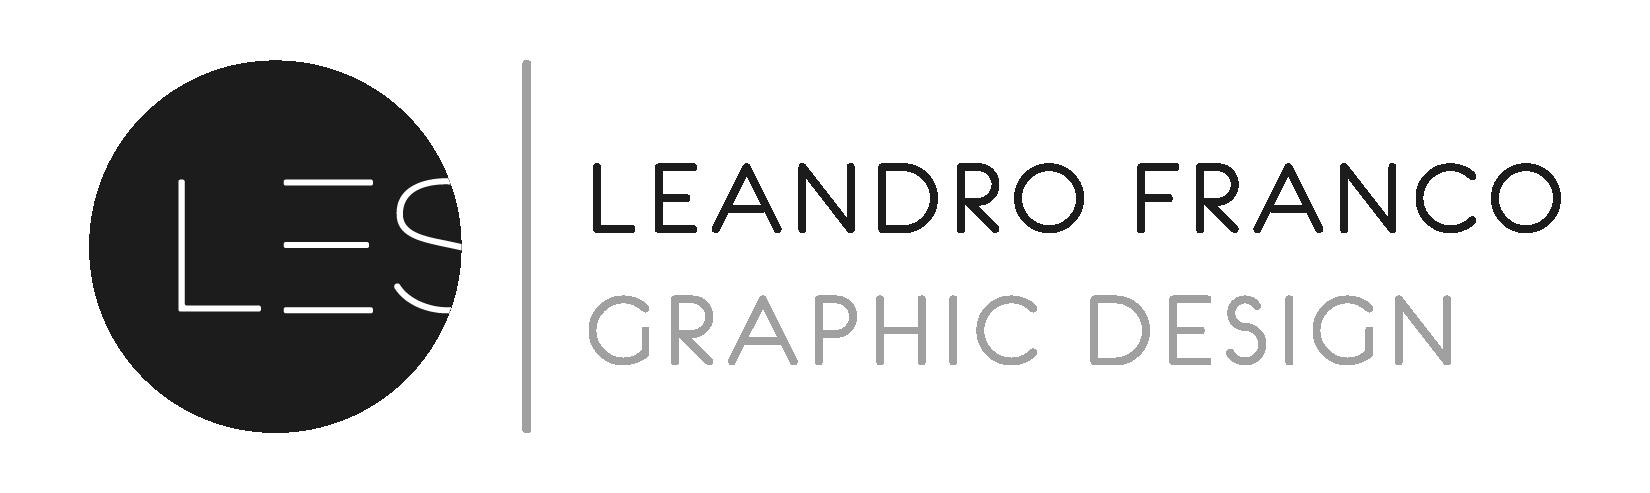 leandro franco logotipo